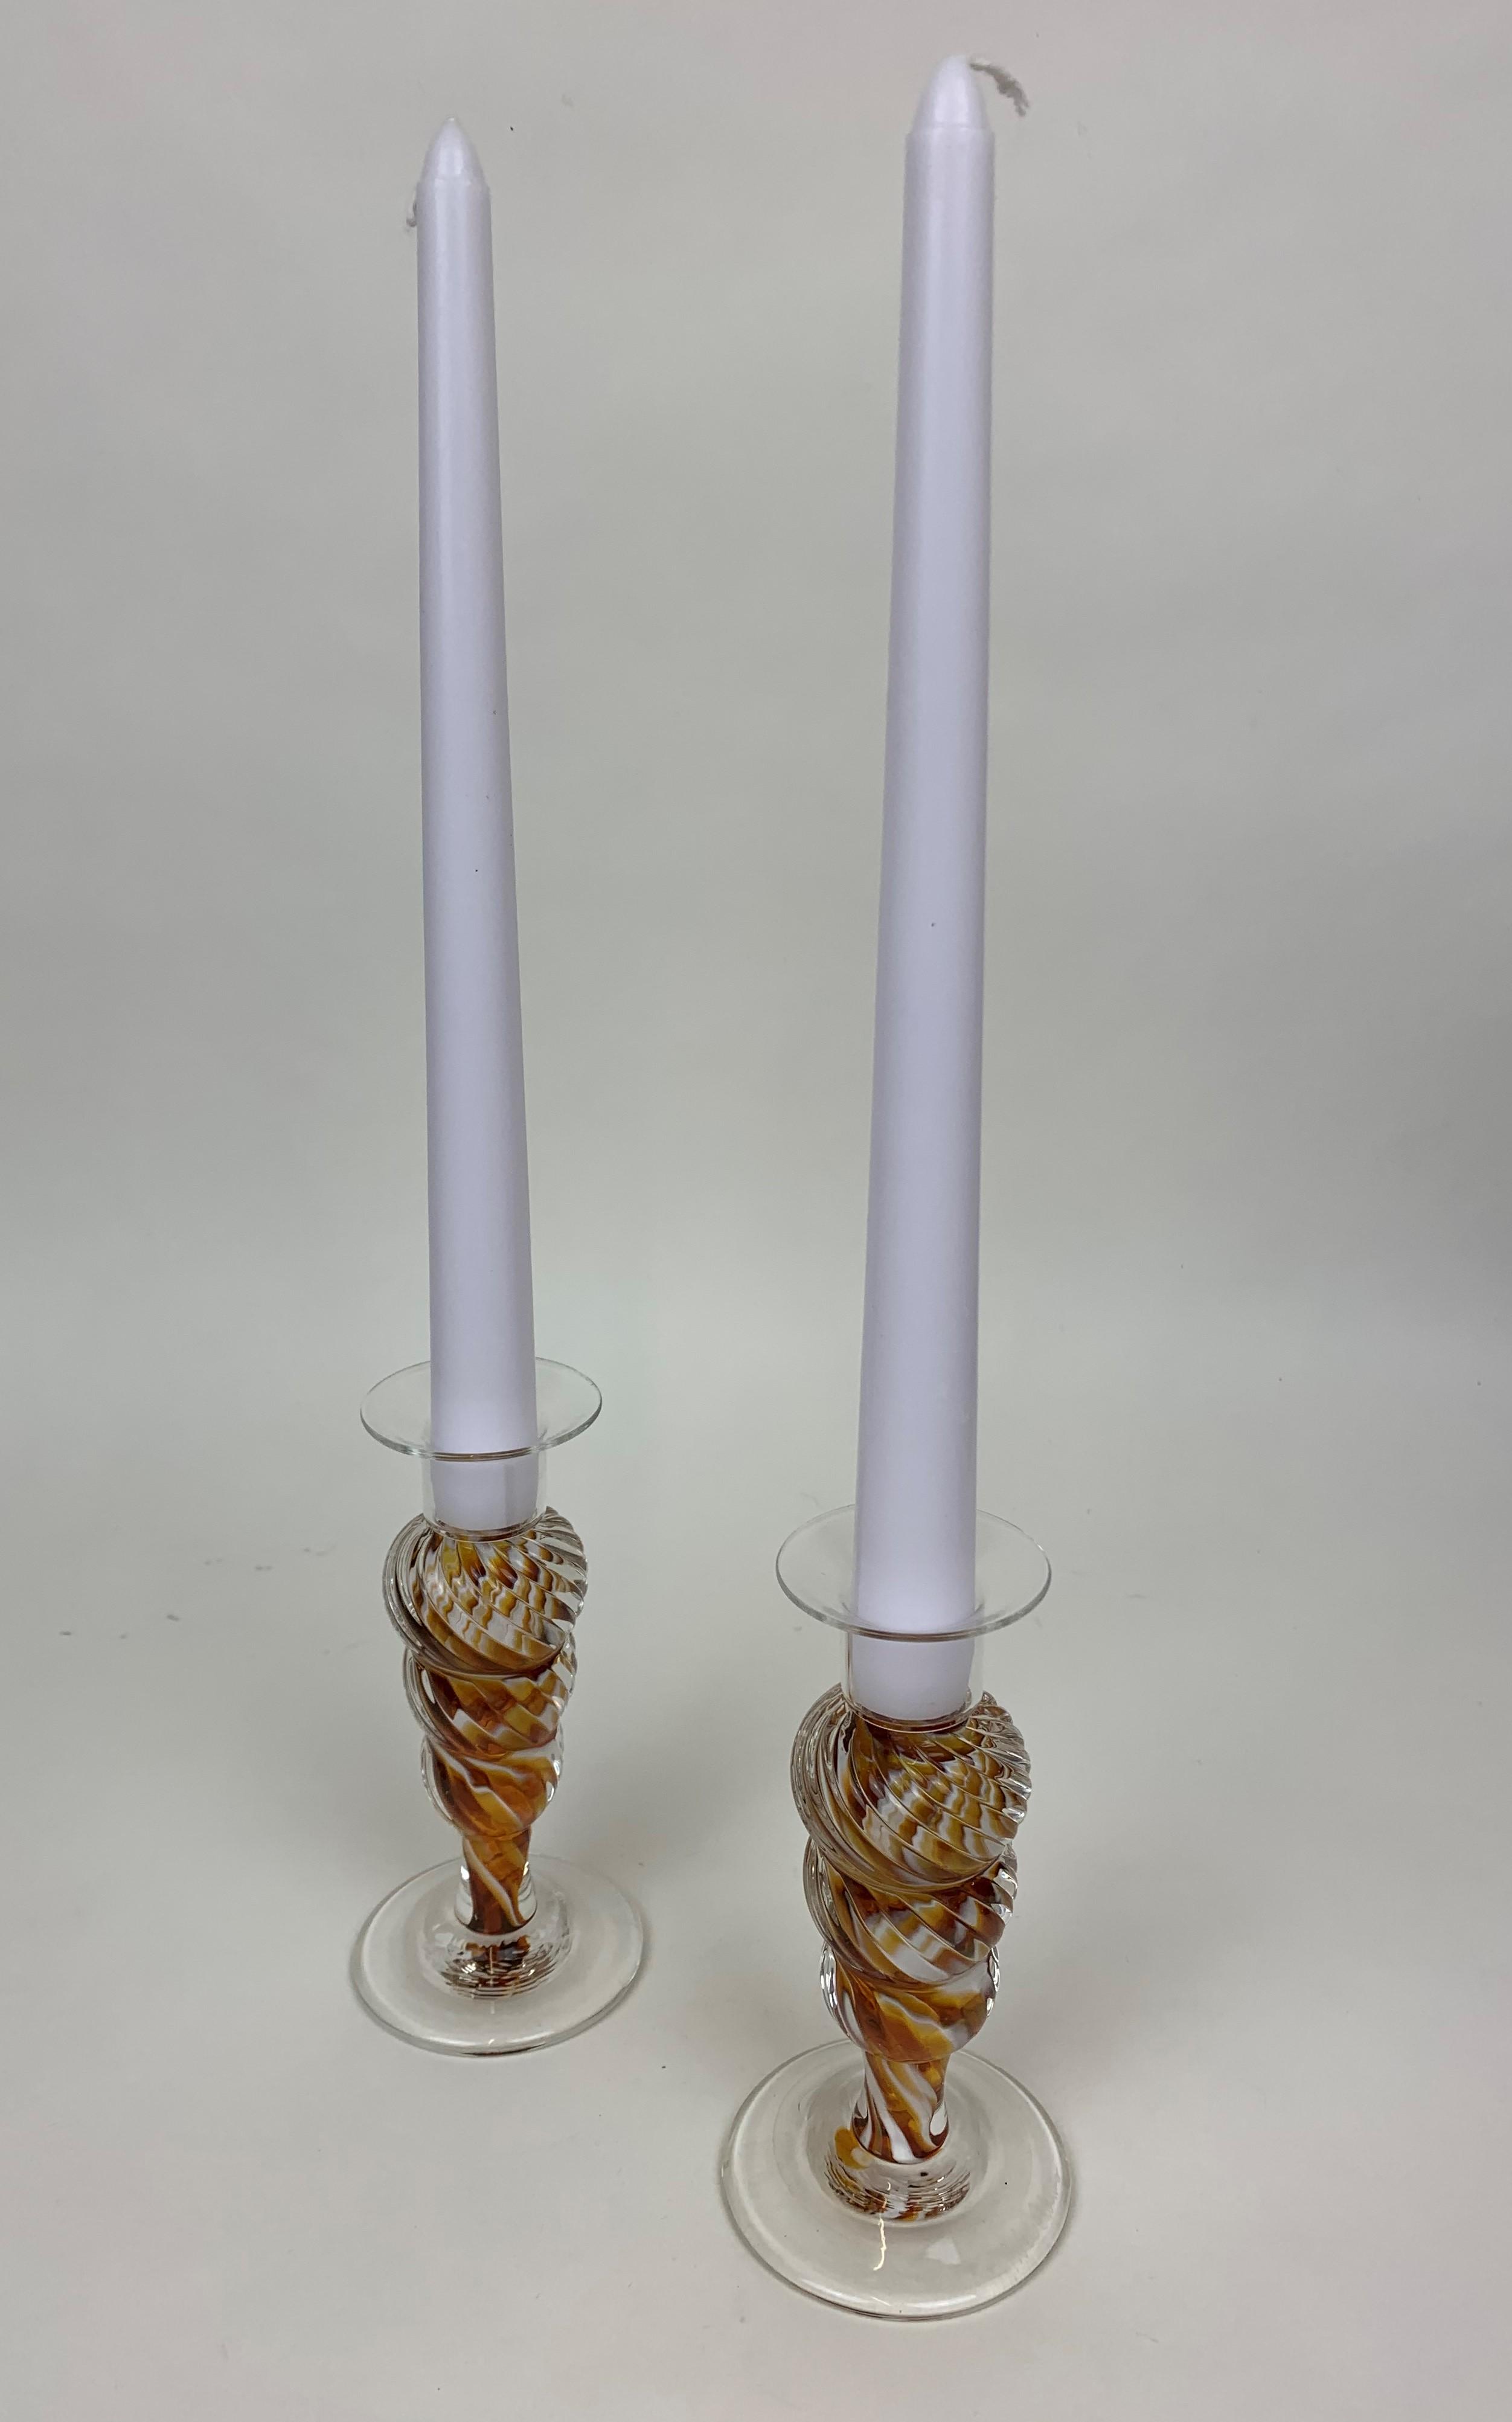 Optic Candlesticks